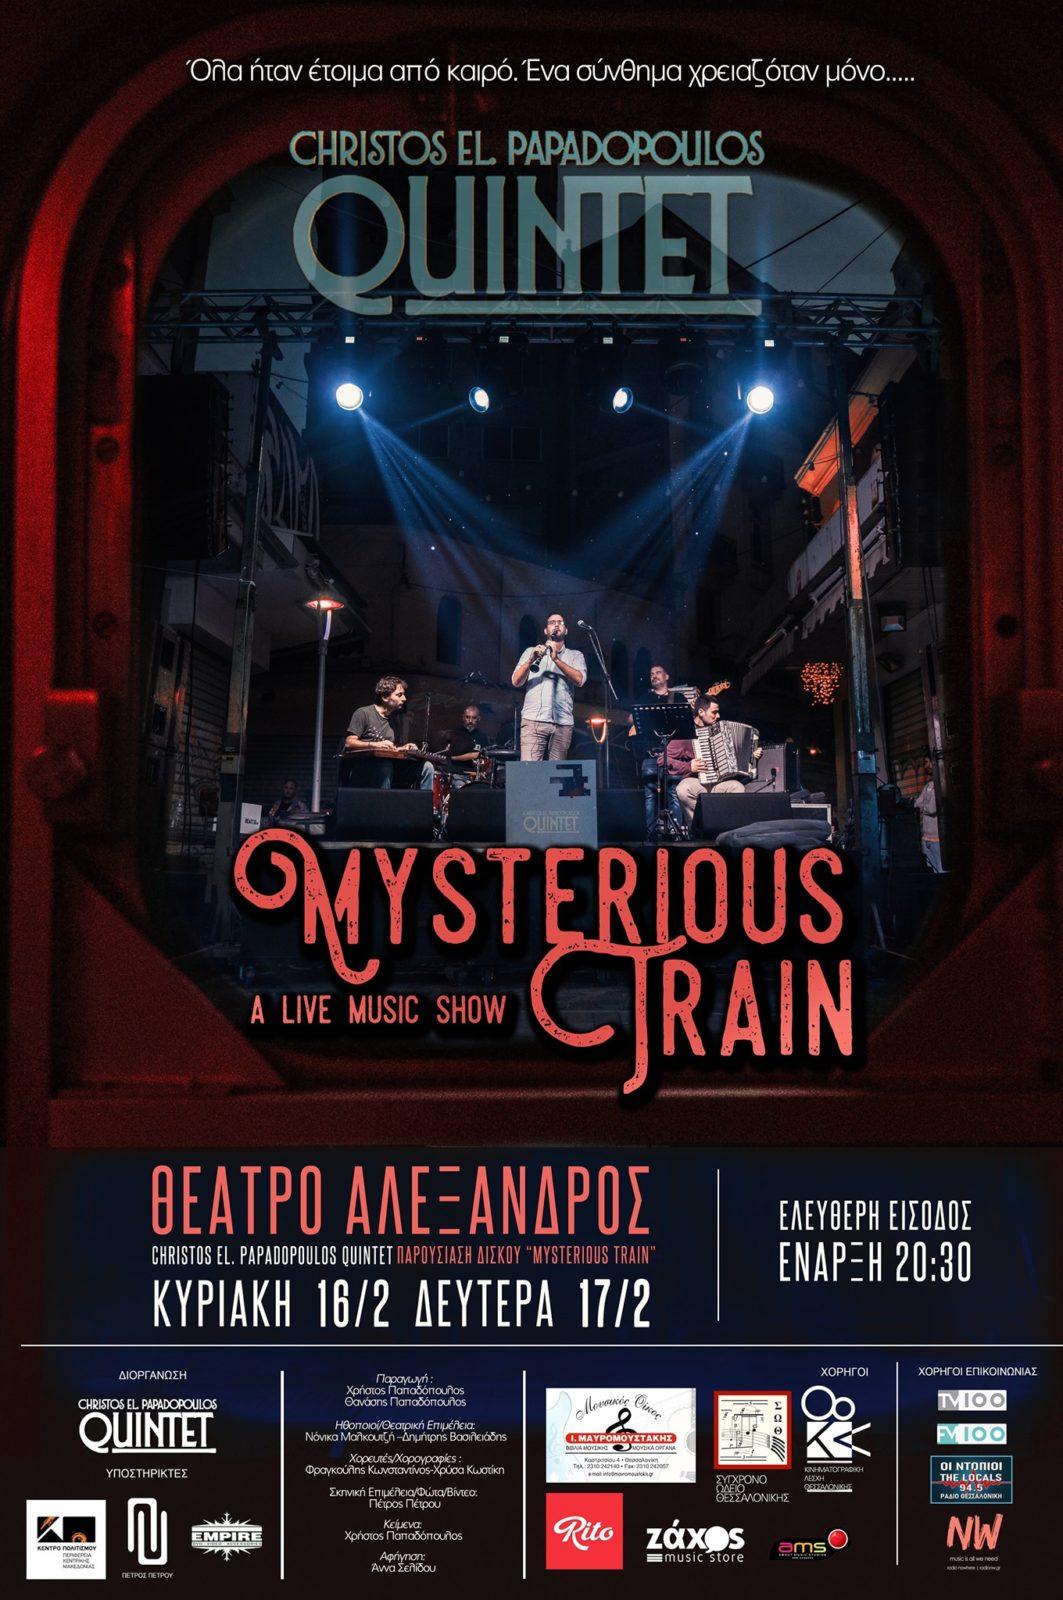 Christos El. Papadopoulos Qintet Mysterious Train Music Show 16 17 2 2020, Théatro Aléxandros